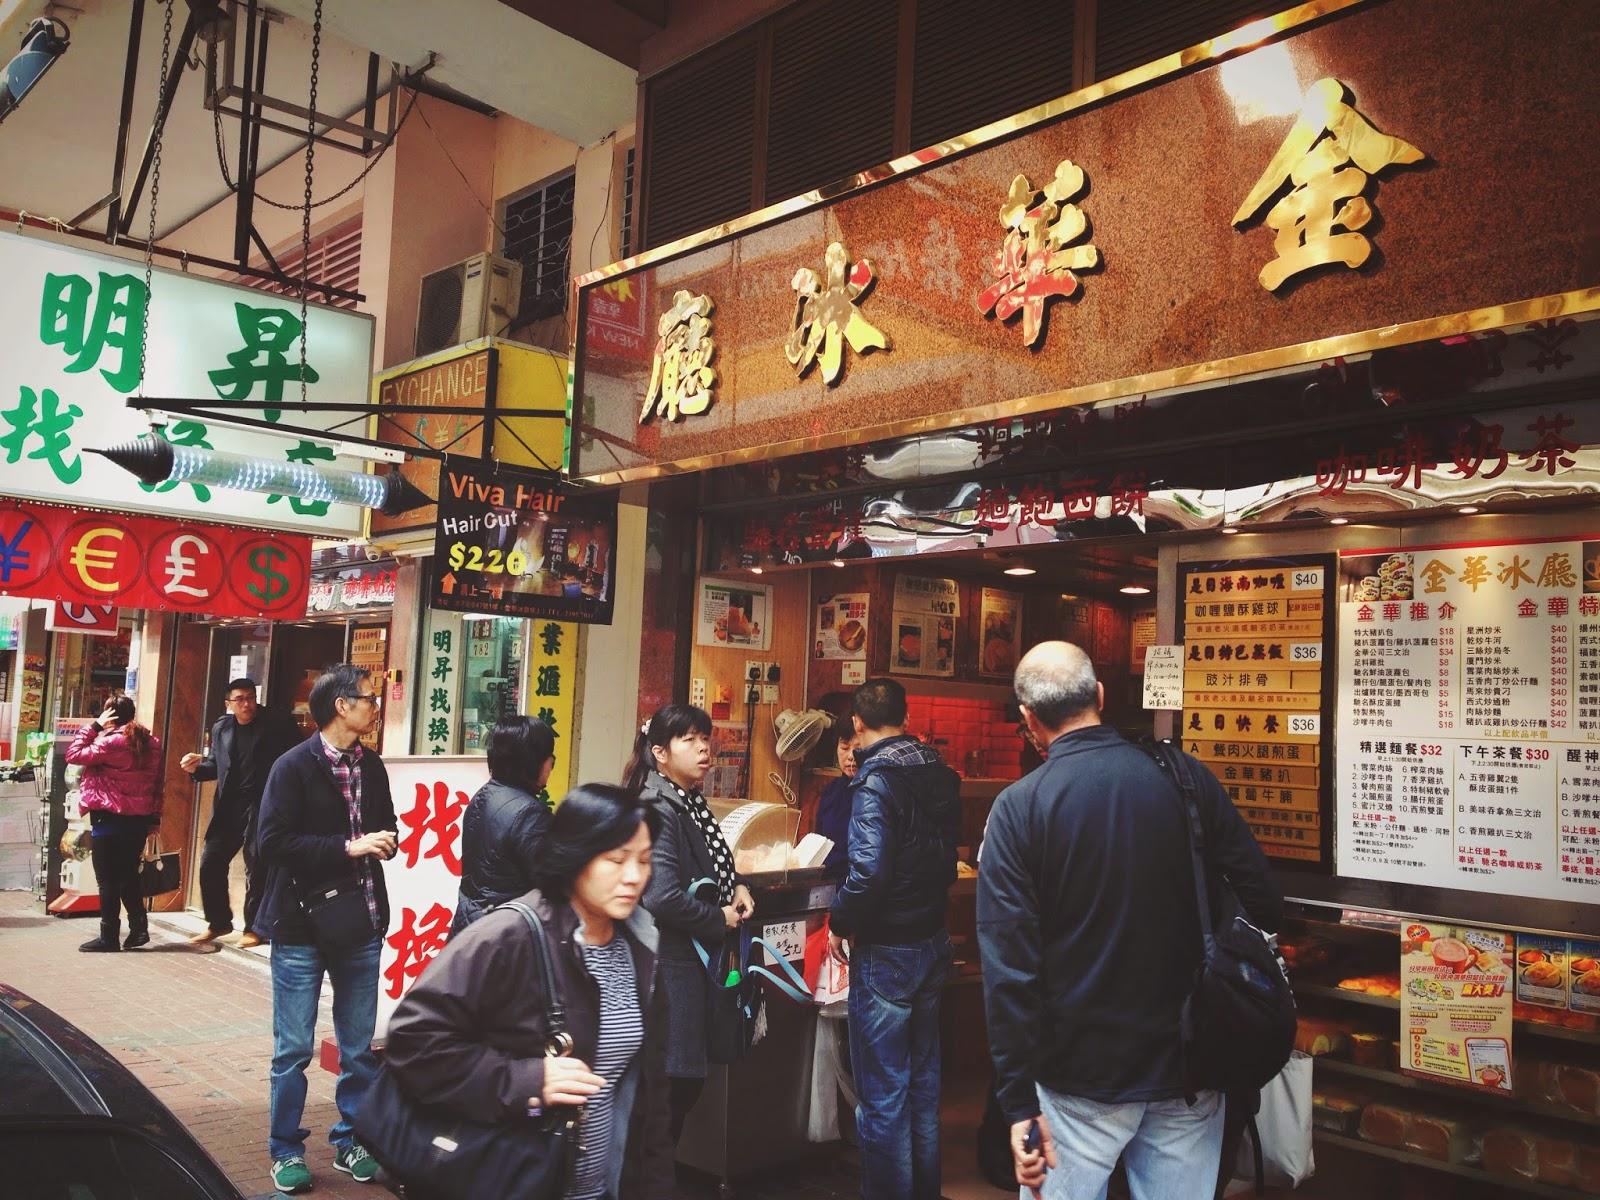 Kum Wah Cafe Bute St Mongkok Hong Kong